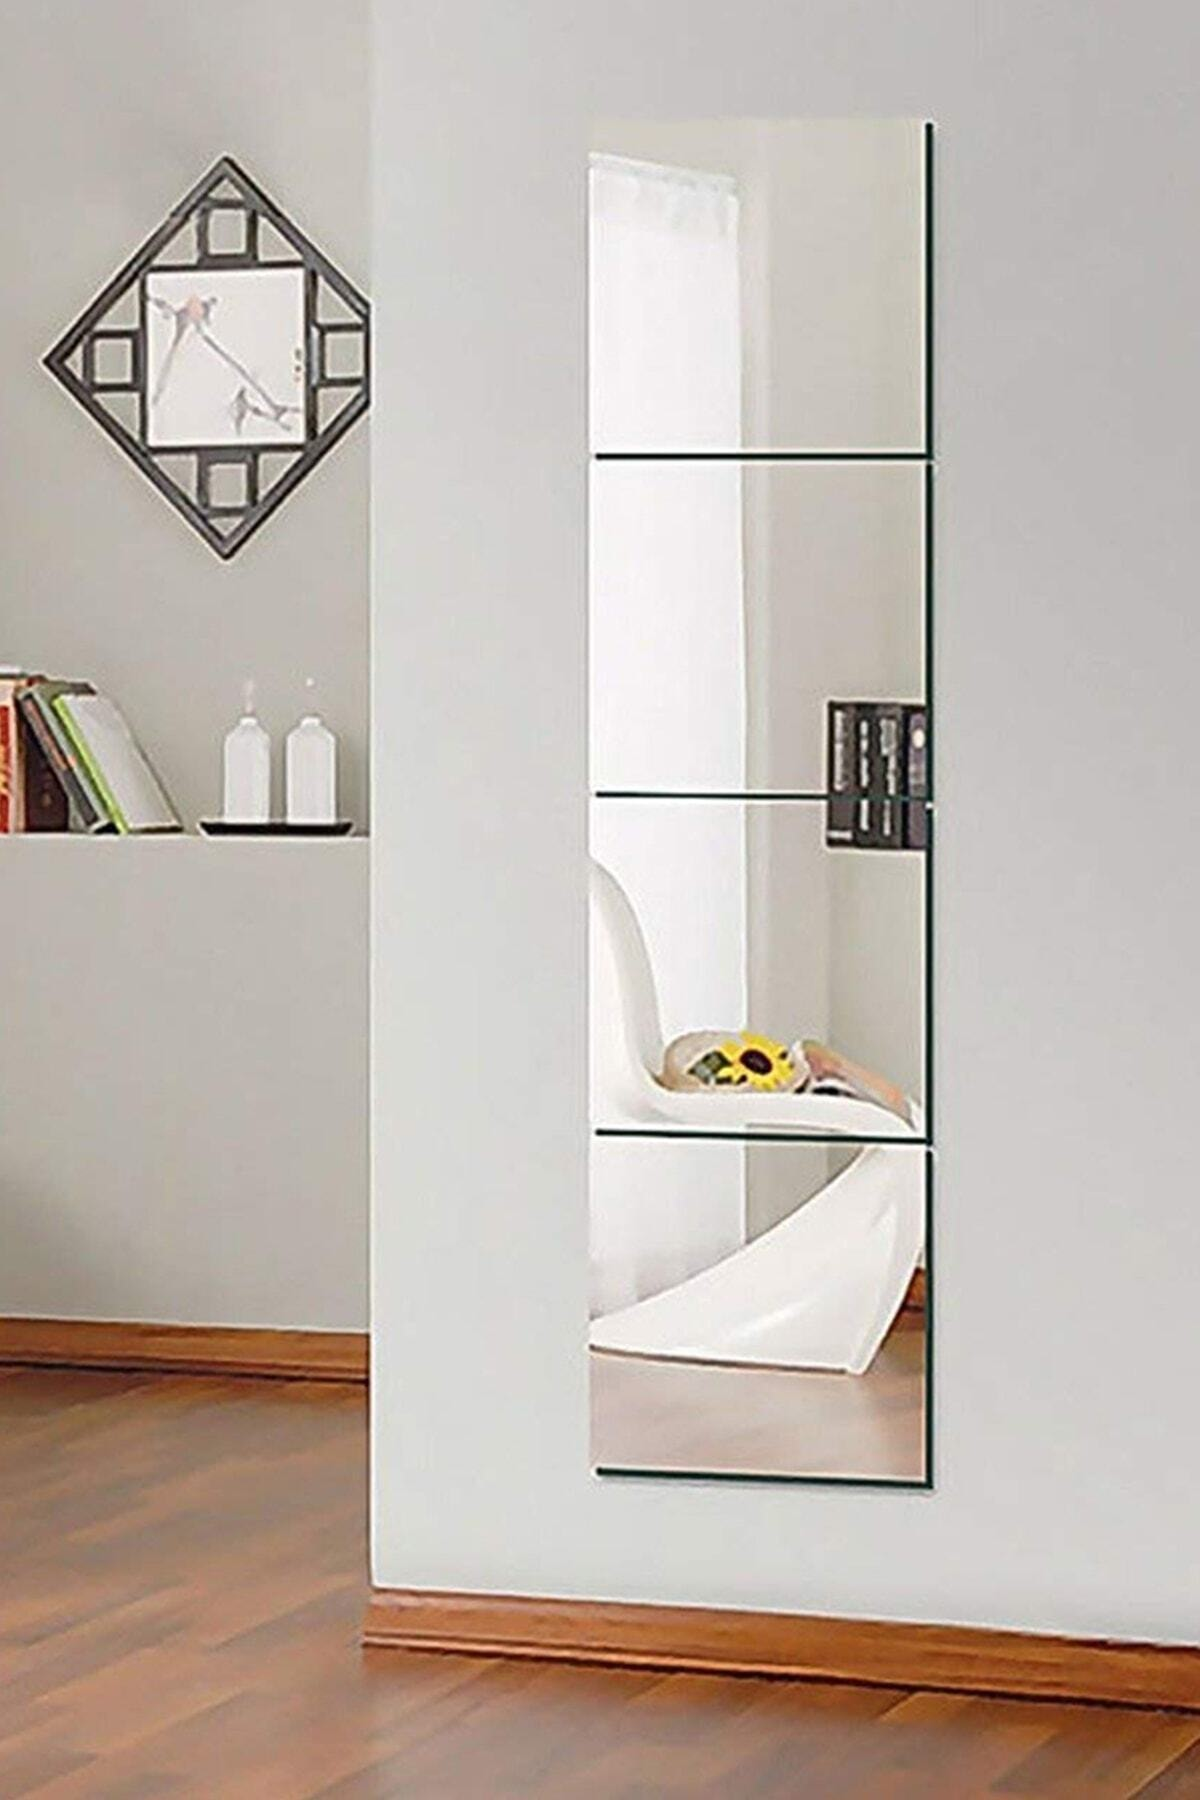 Fekare Dekoratif 4'lü Ayna (30x30cm) 1